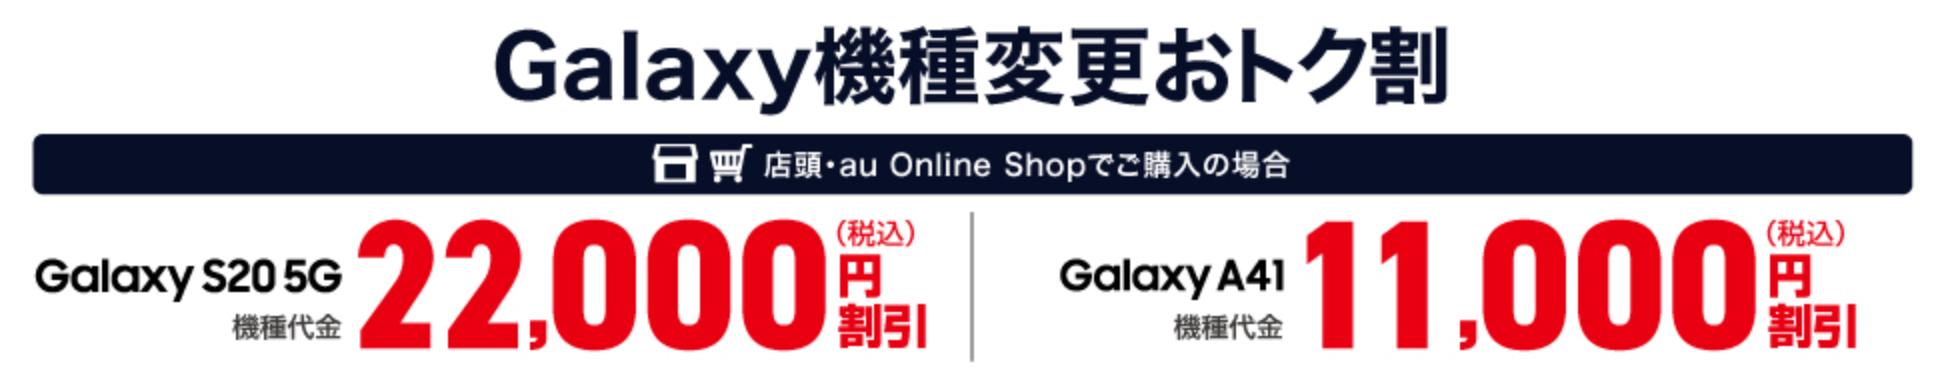 au_エーユー_おすすめ_スマホ_スマートフォン_キャンペーン_Galaxy機種変更おトク割